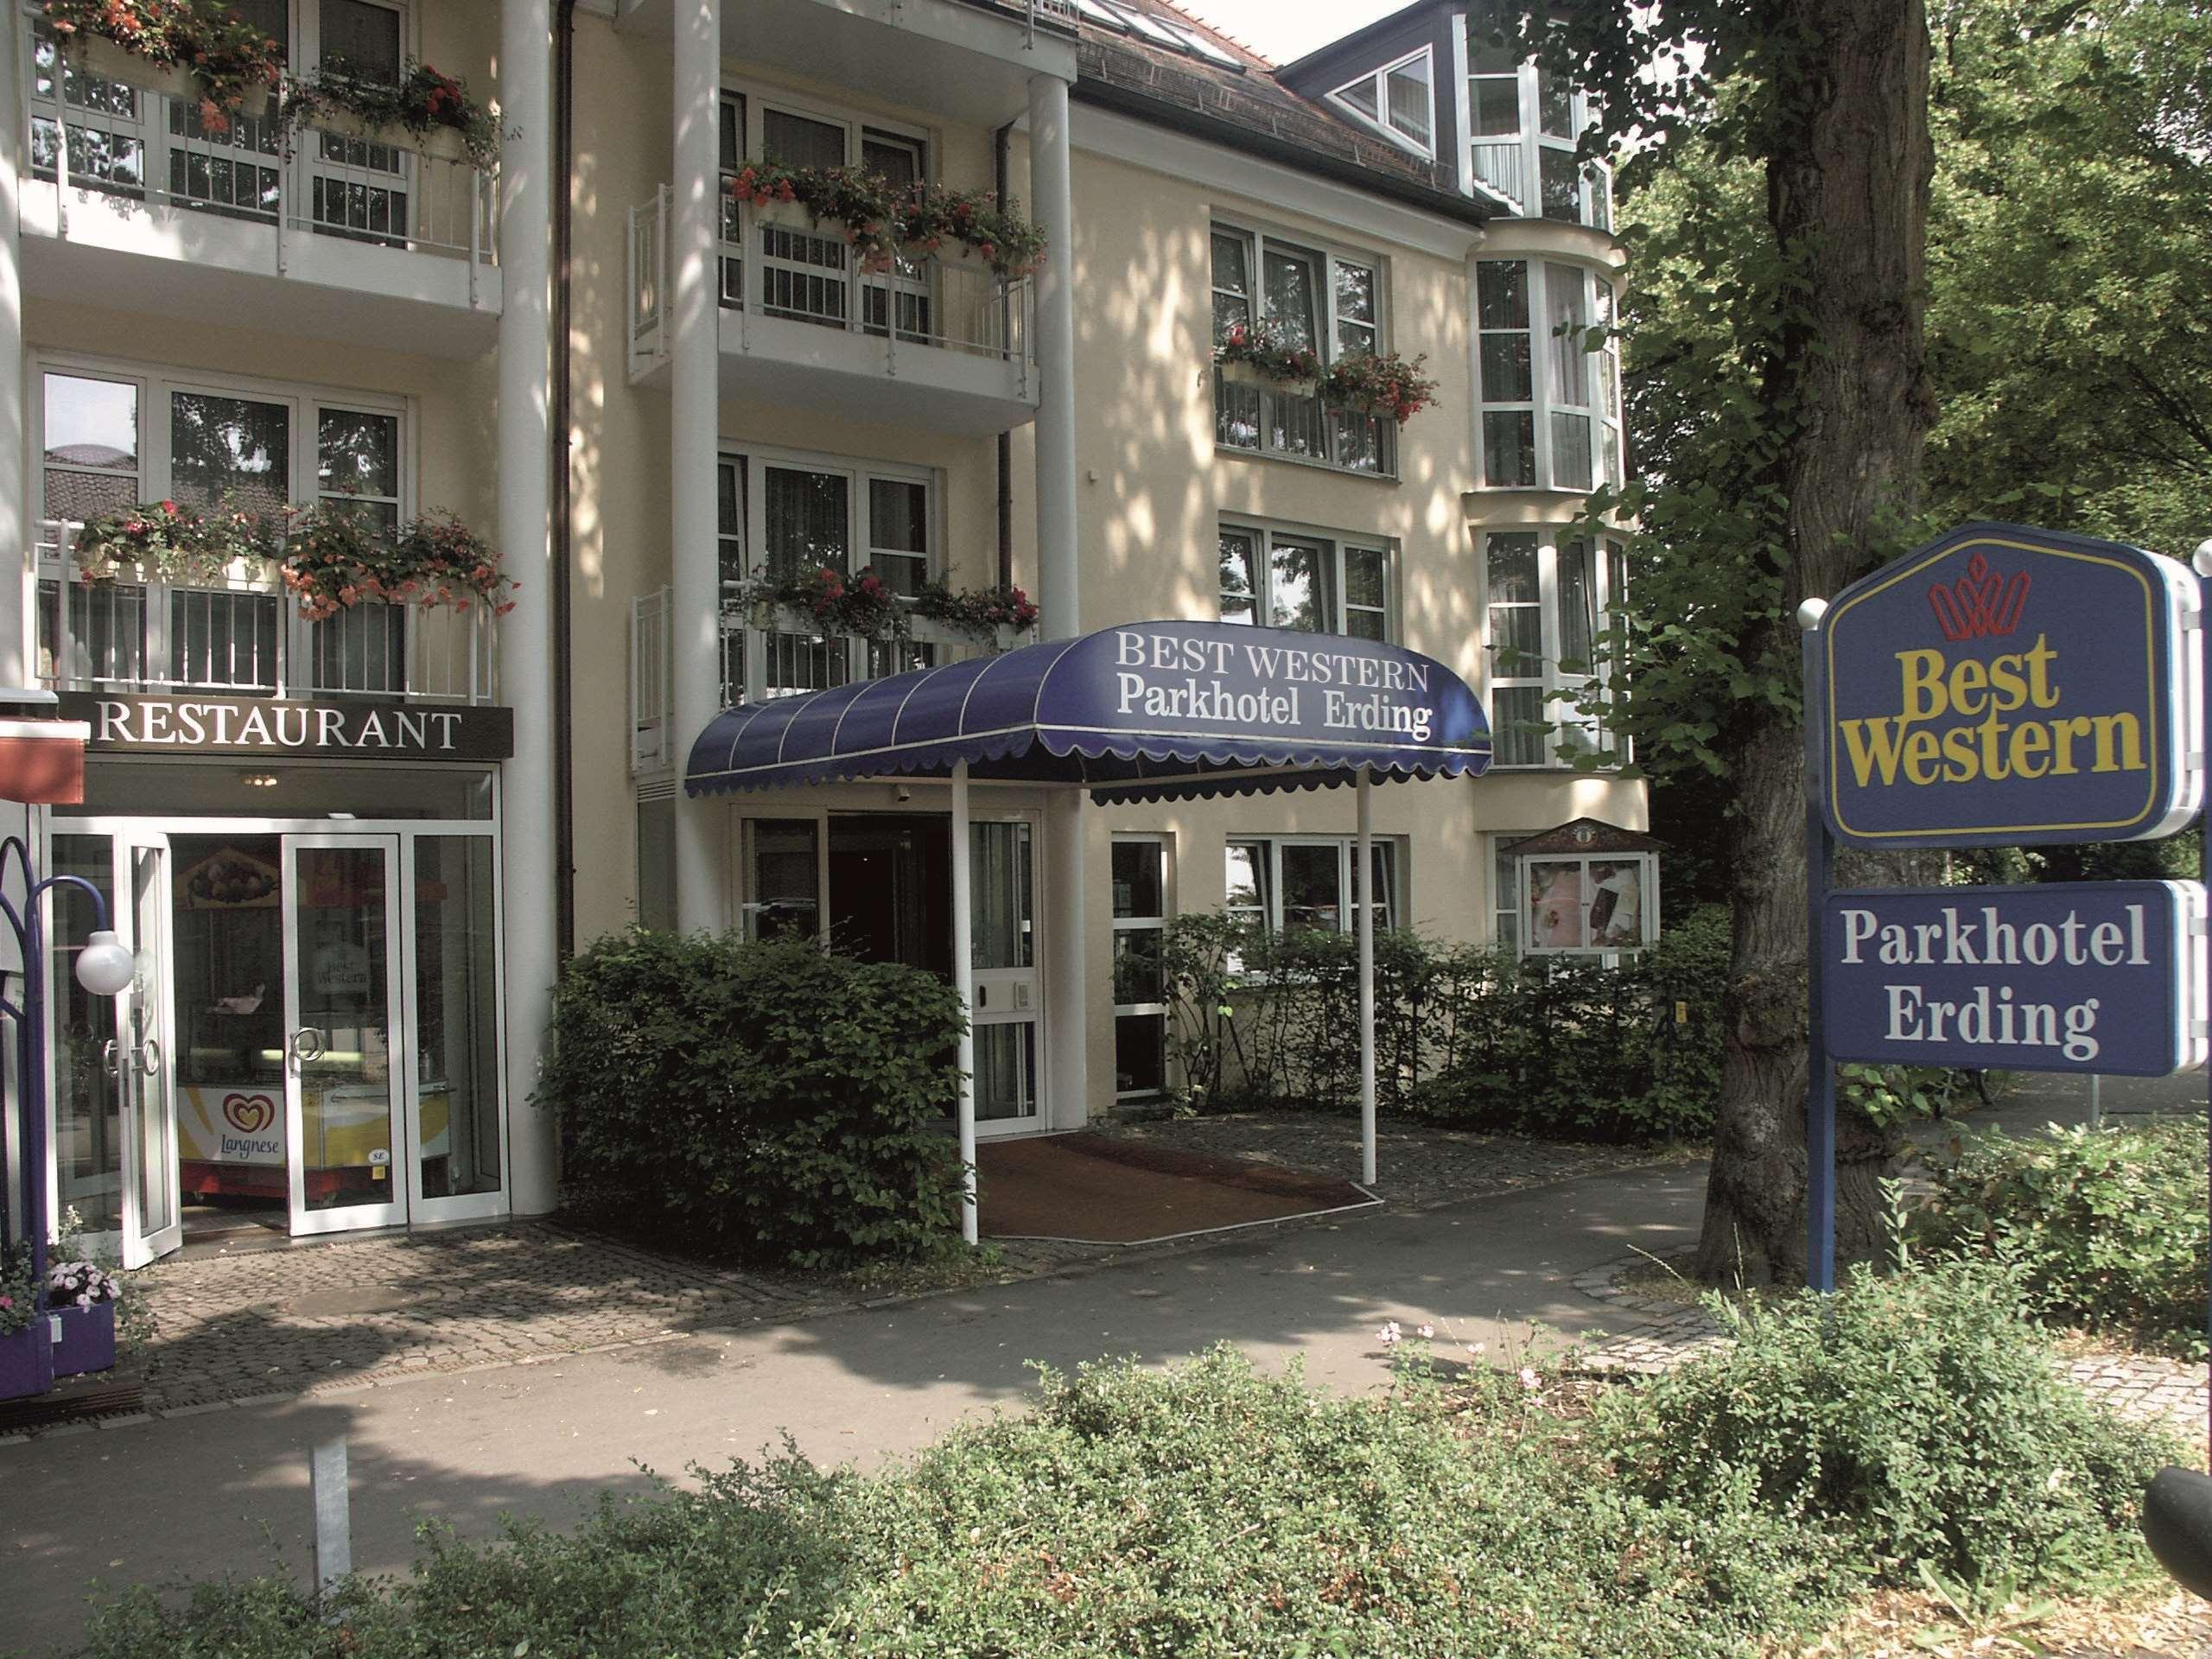 Hotel Erding Best Western Parkhotel